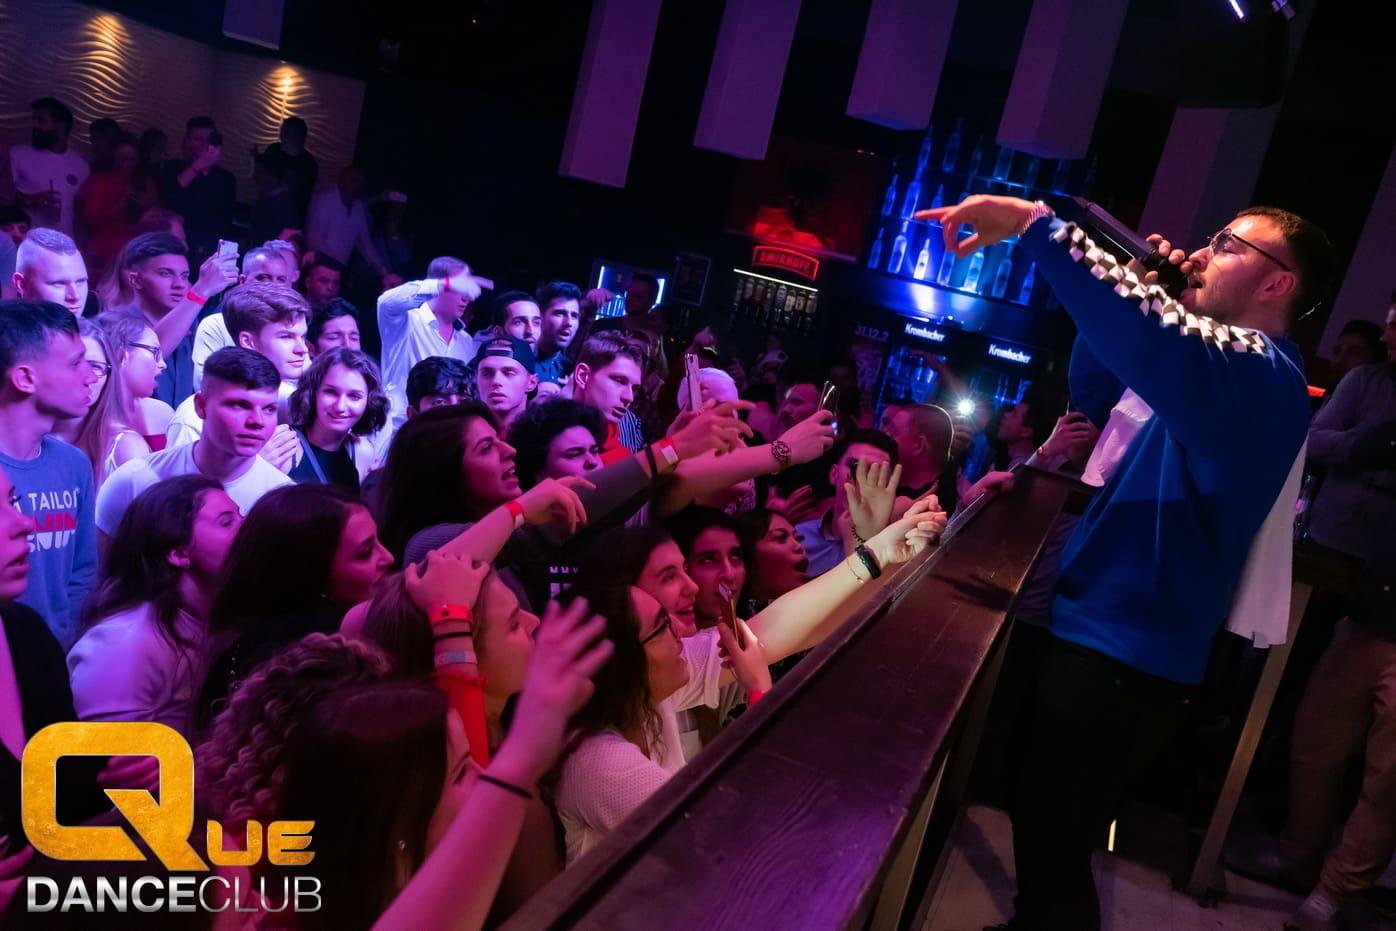 2018_12_08_Que_Danceclub_Paparazzo_Night_Ardian_Bujupi_Live_Nightlife_Scene_Timo_064